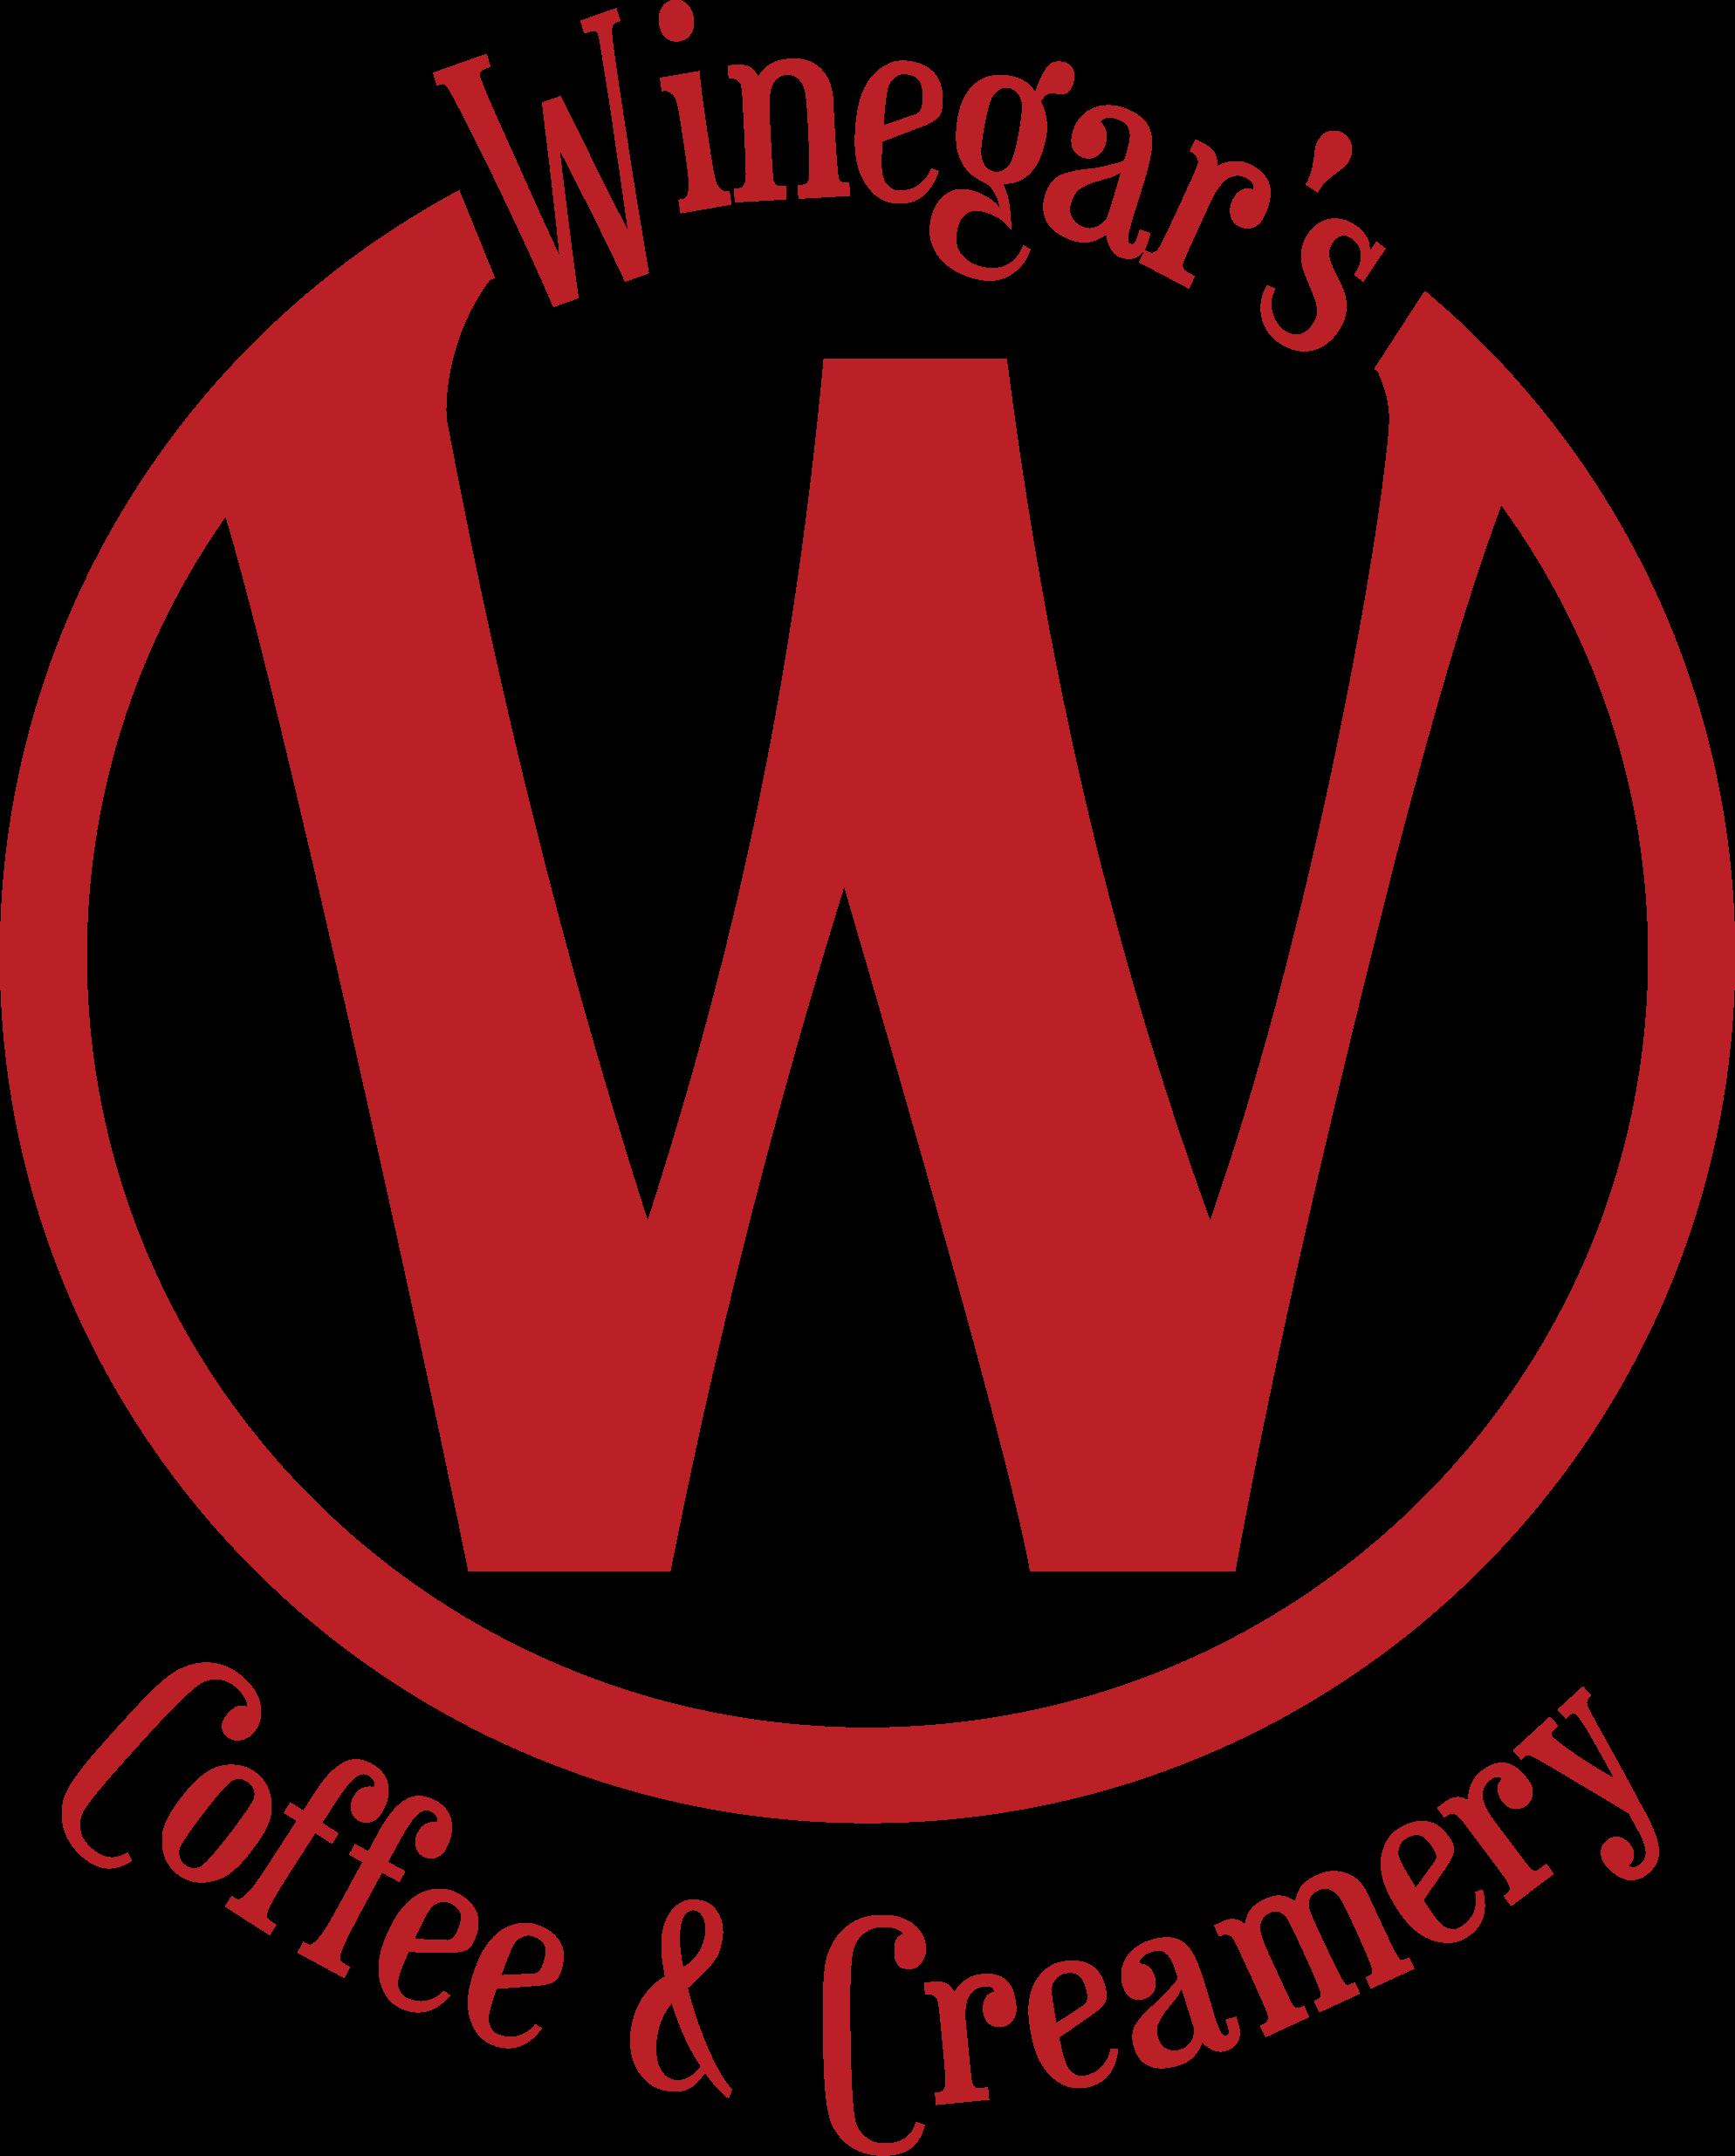 Winegar's Coffee & Creamery